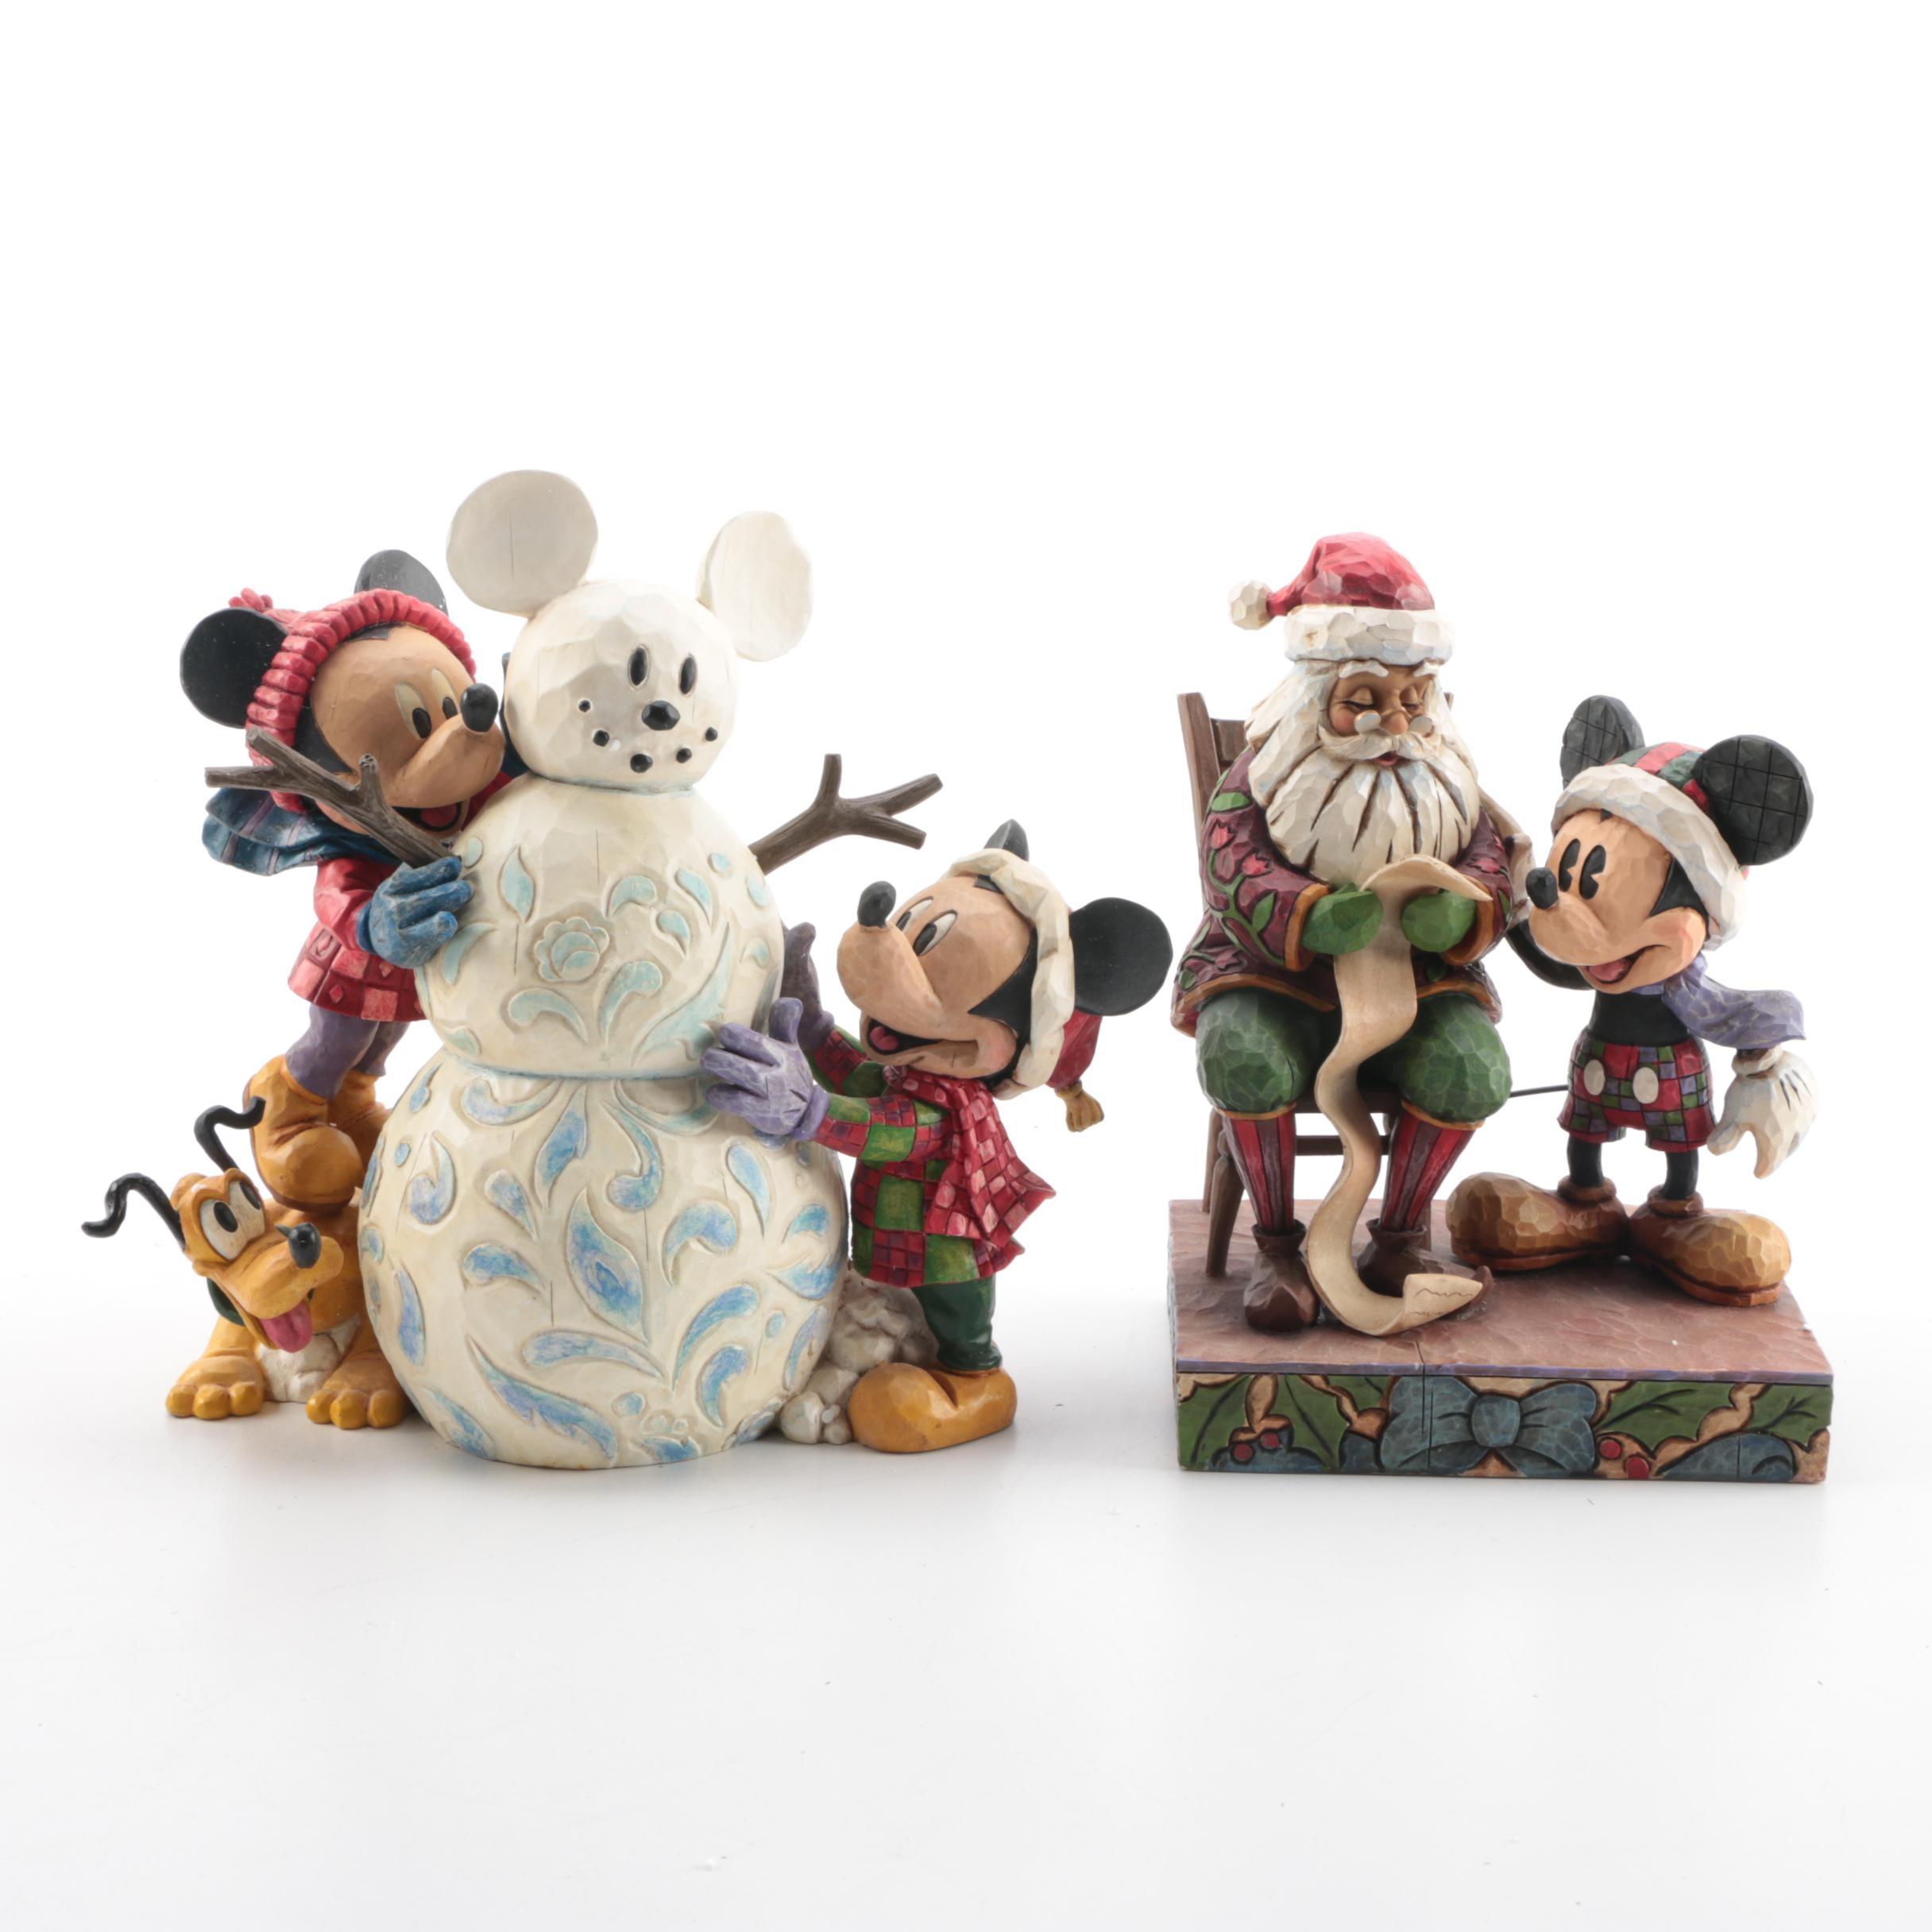 Pair of Jim Shore for Enesco Walt Disney Showcase Collection Christmas Figurines